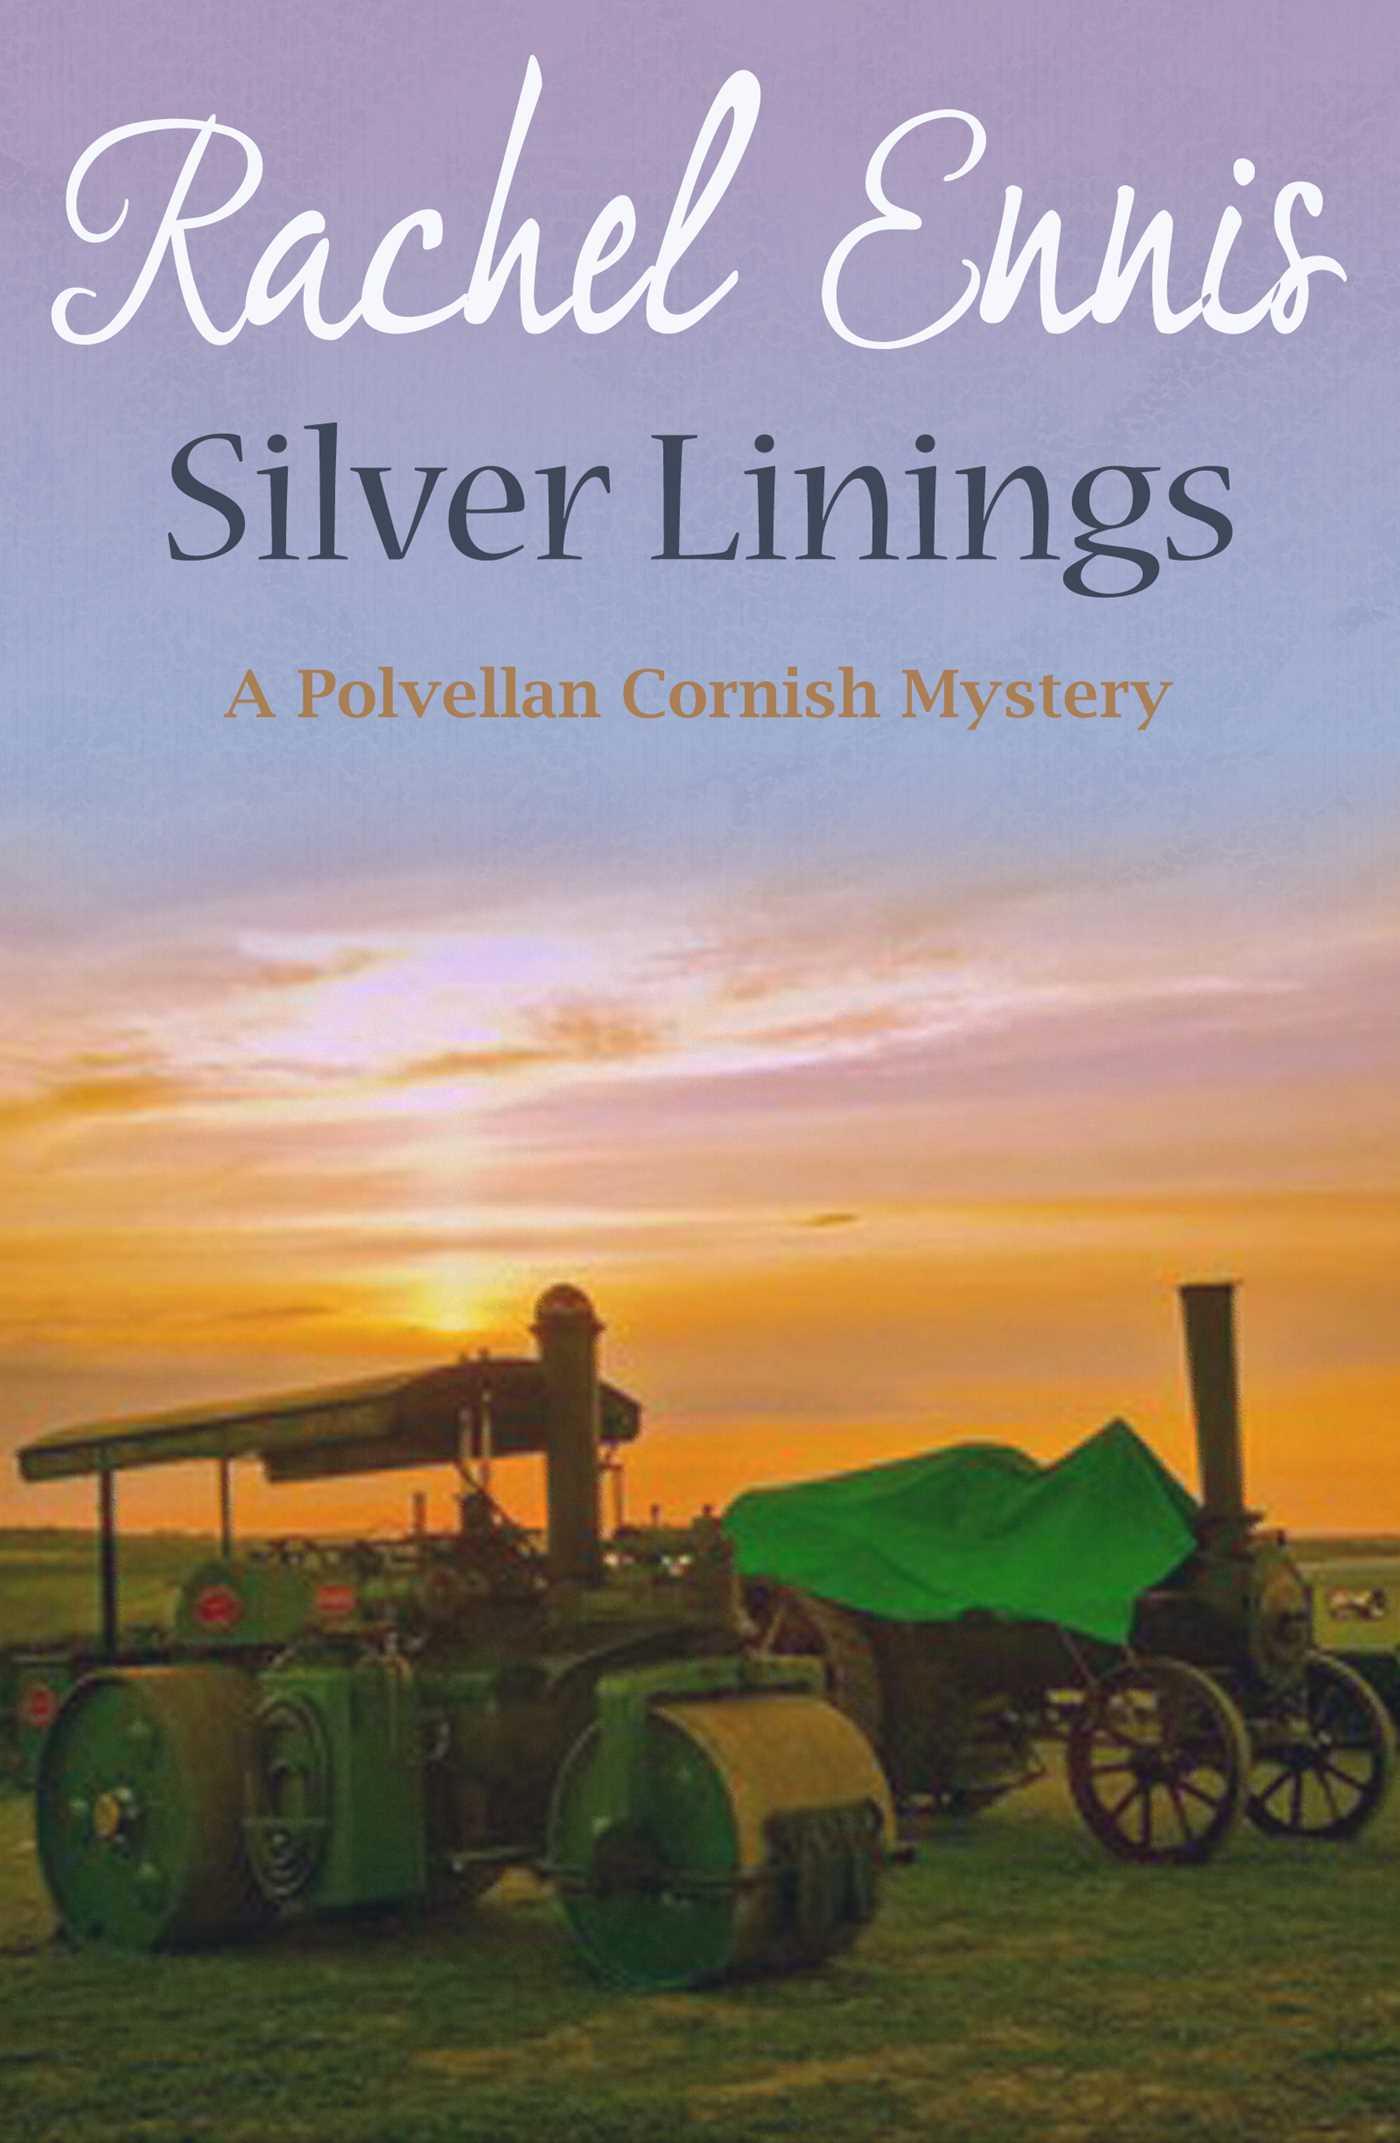 Silver linings 9781682996225 hr